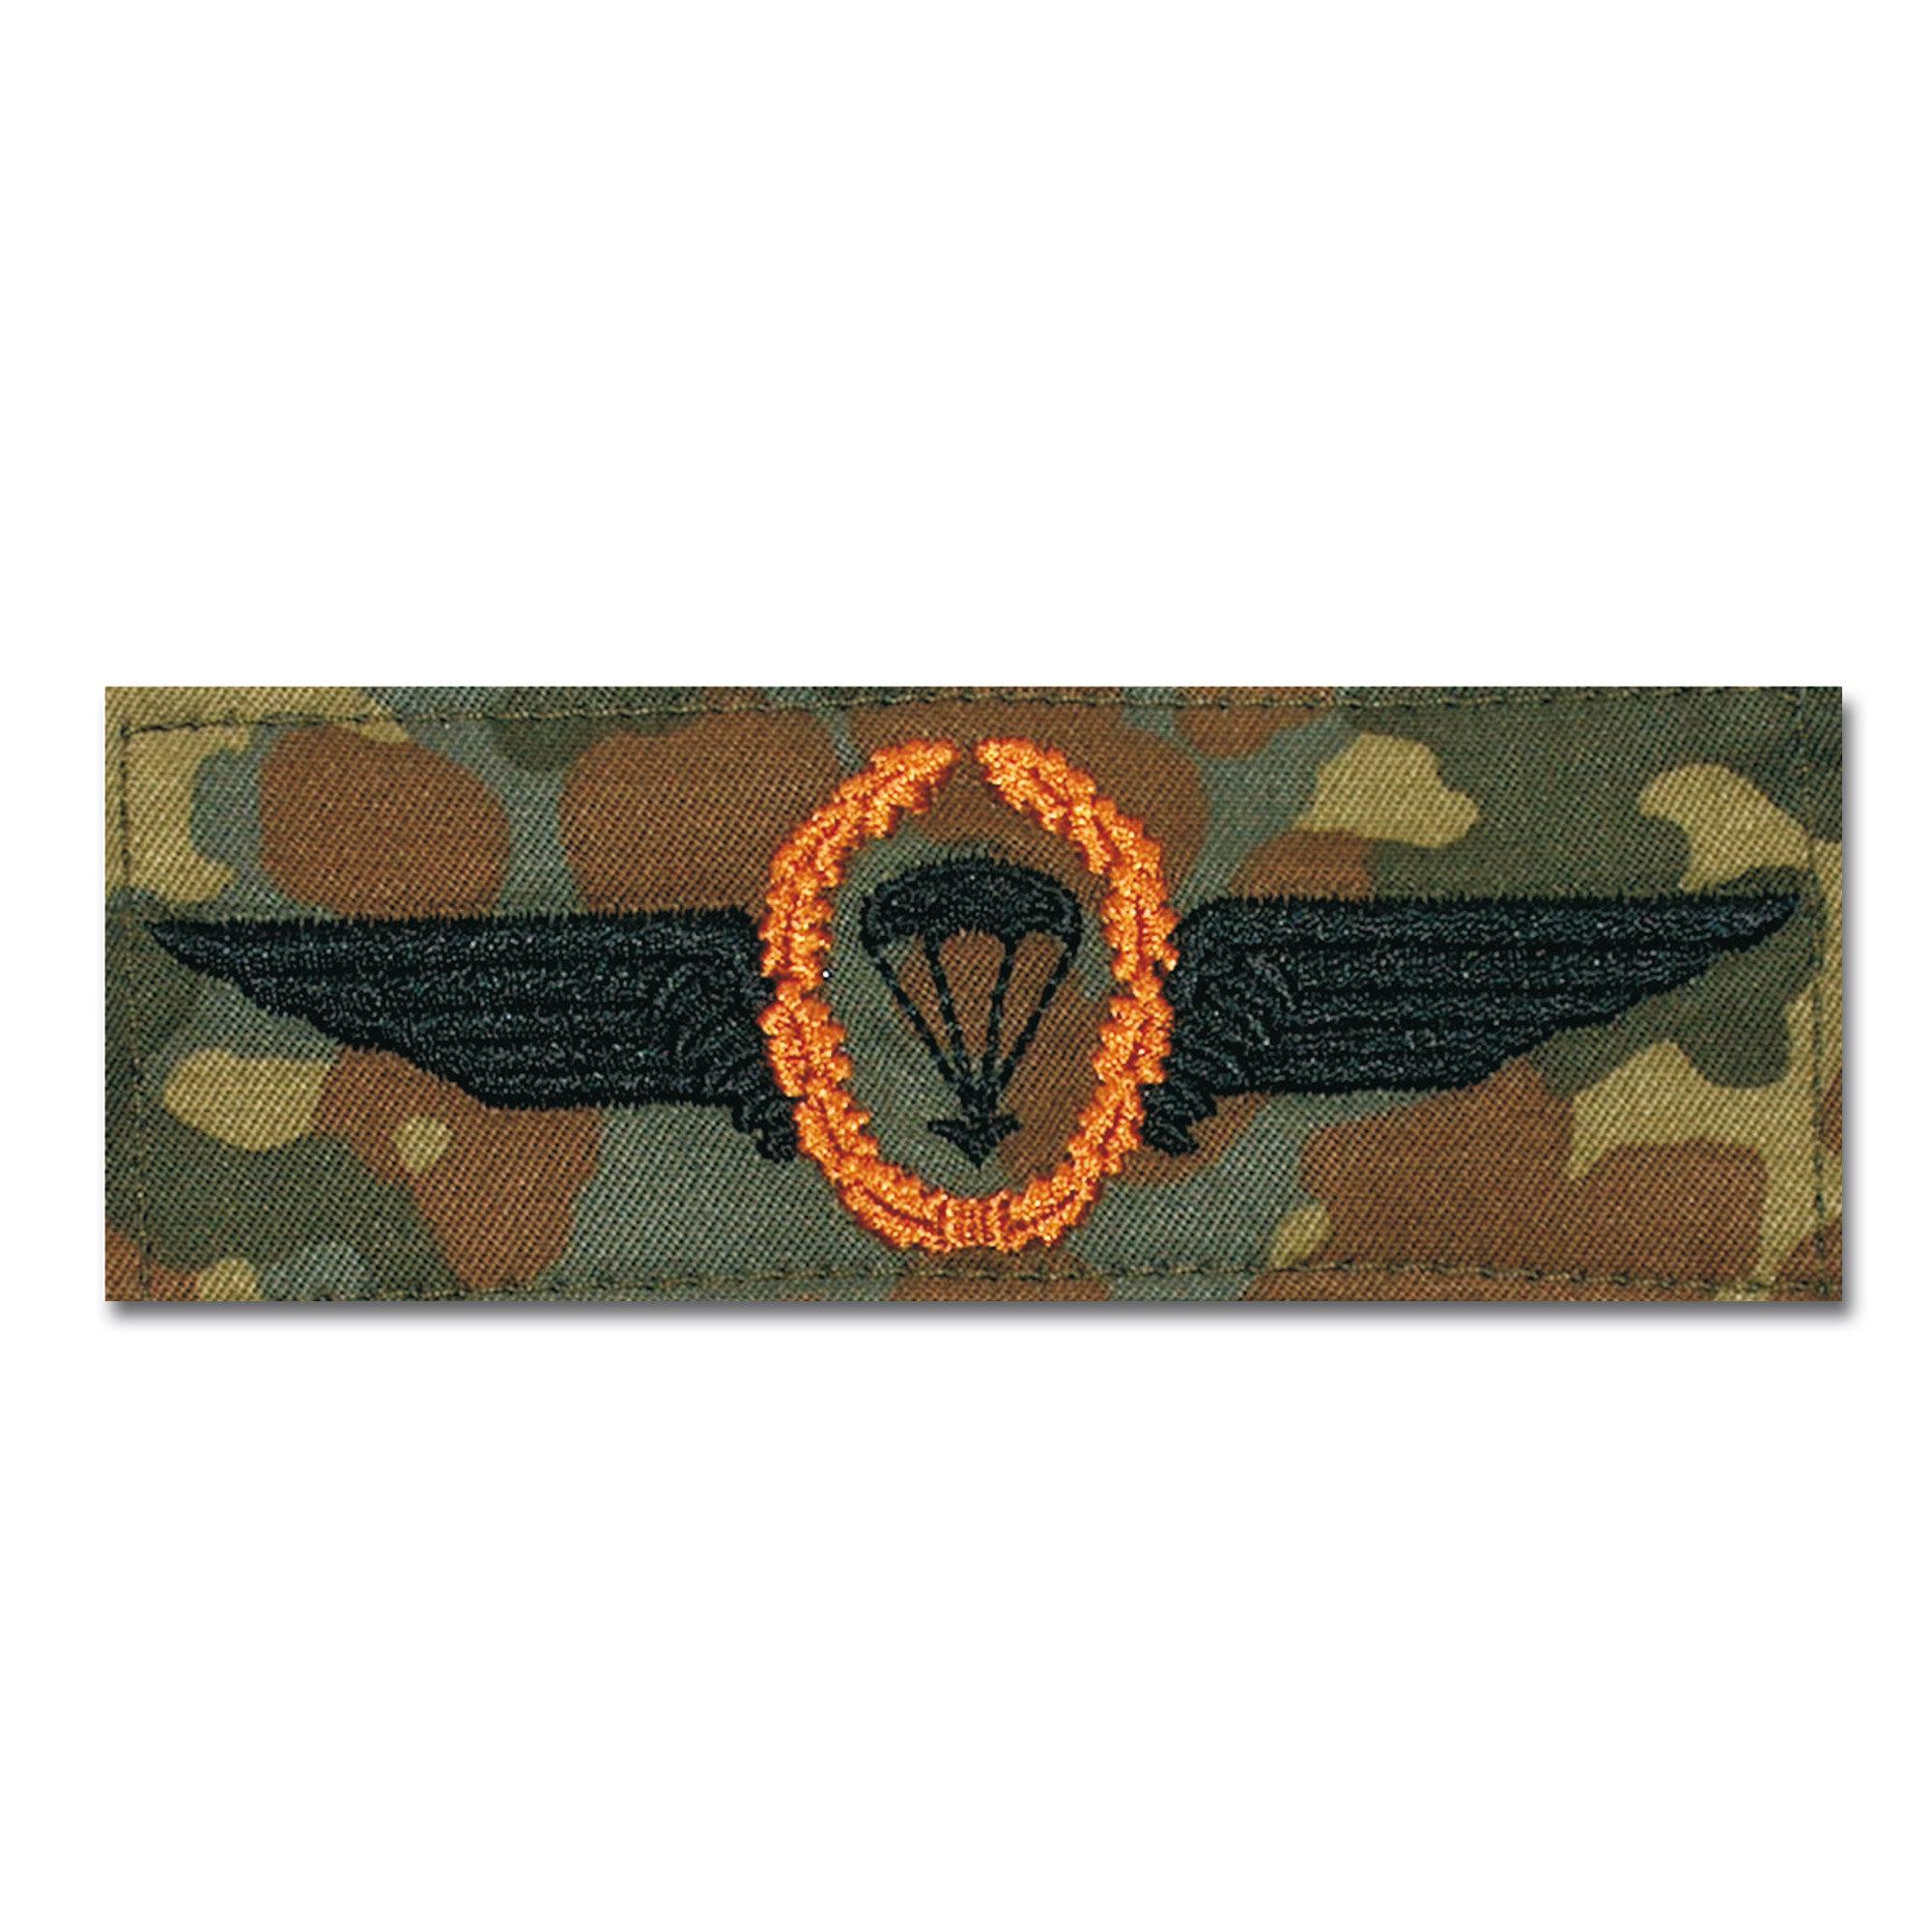 Abz. BW Fallschirmspringer bronce/fleckt